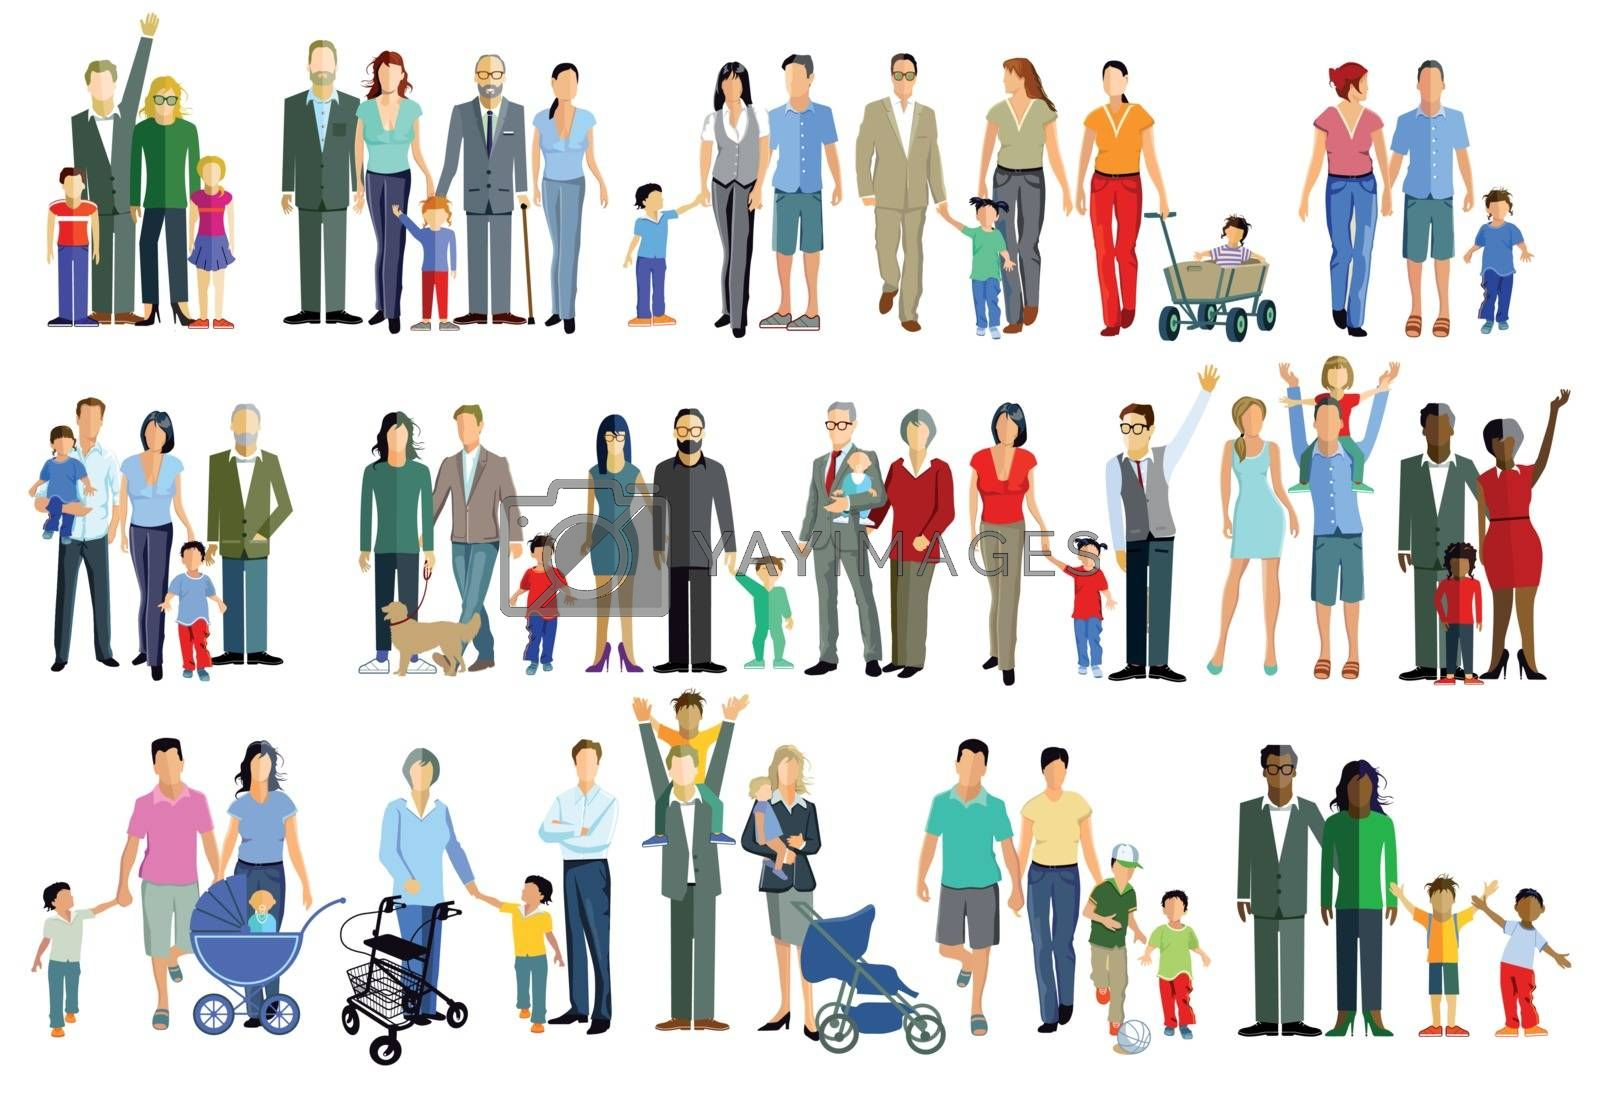 Family generation groups, illustration